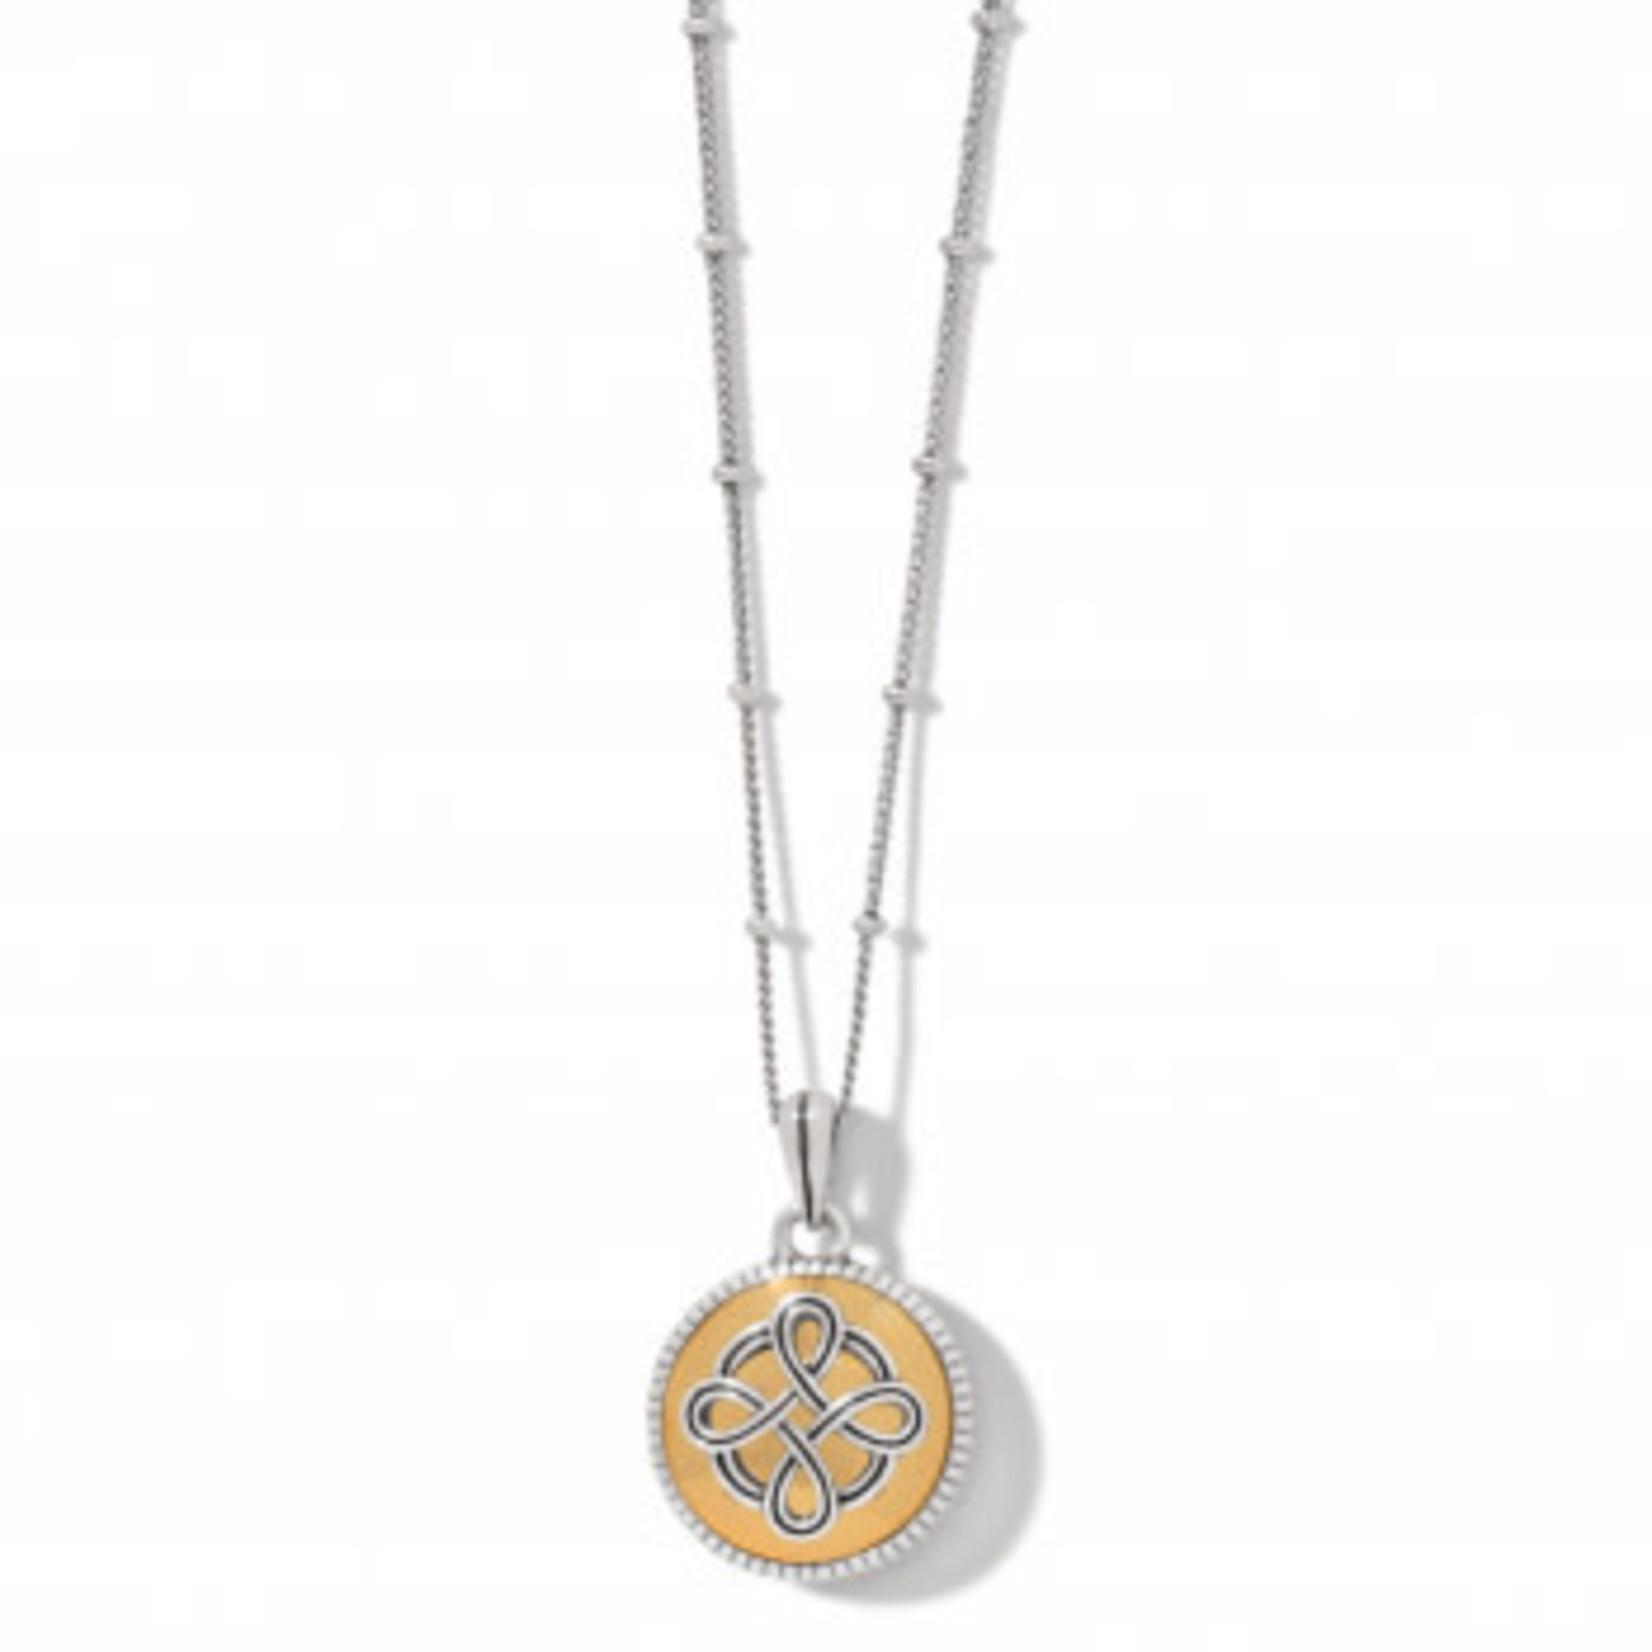 Brighton Interlok Noir Reversible Necklace